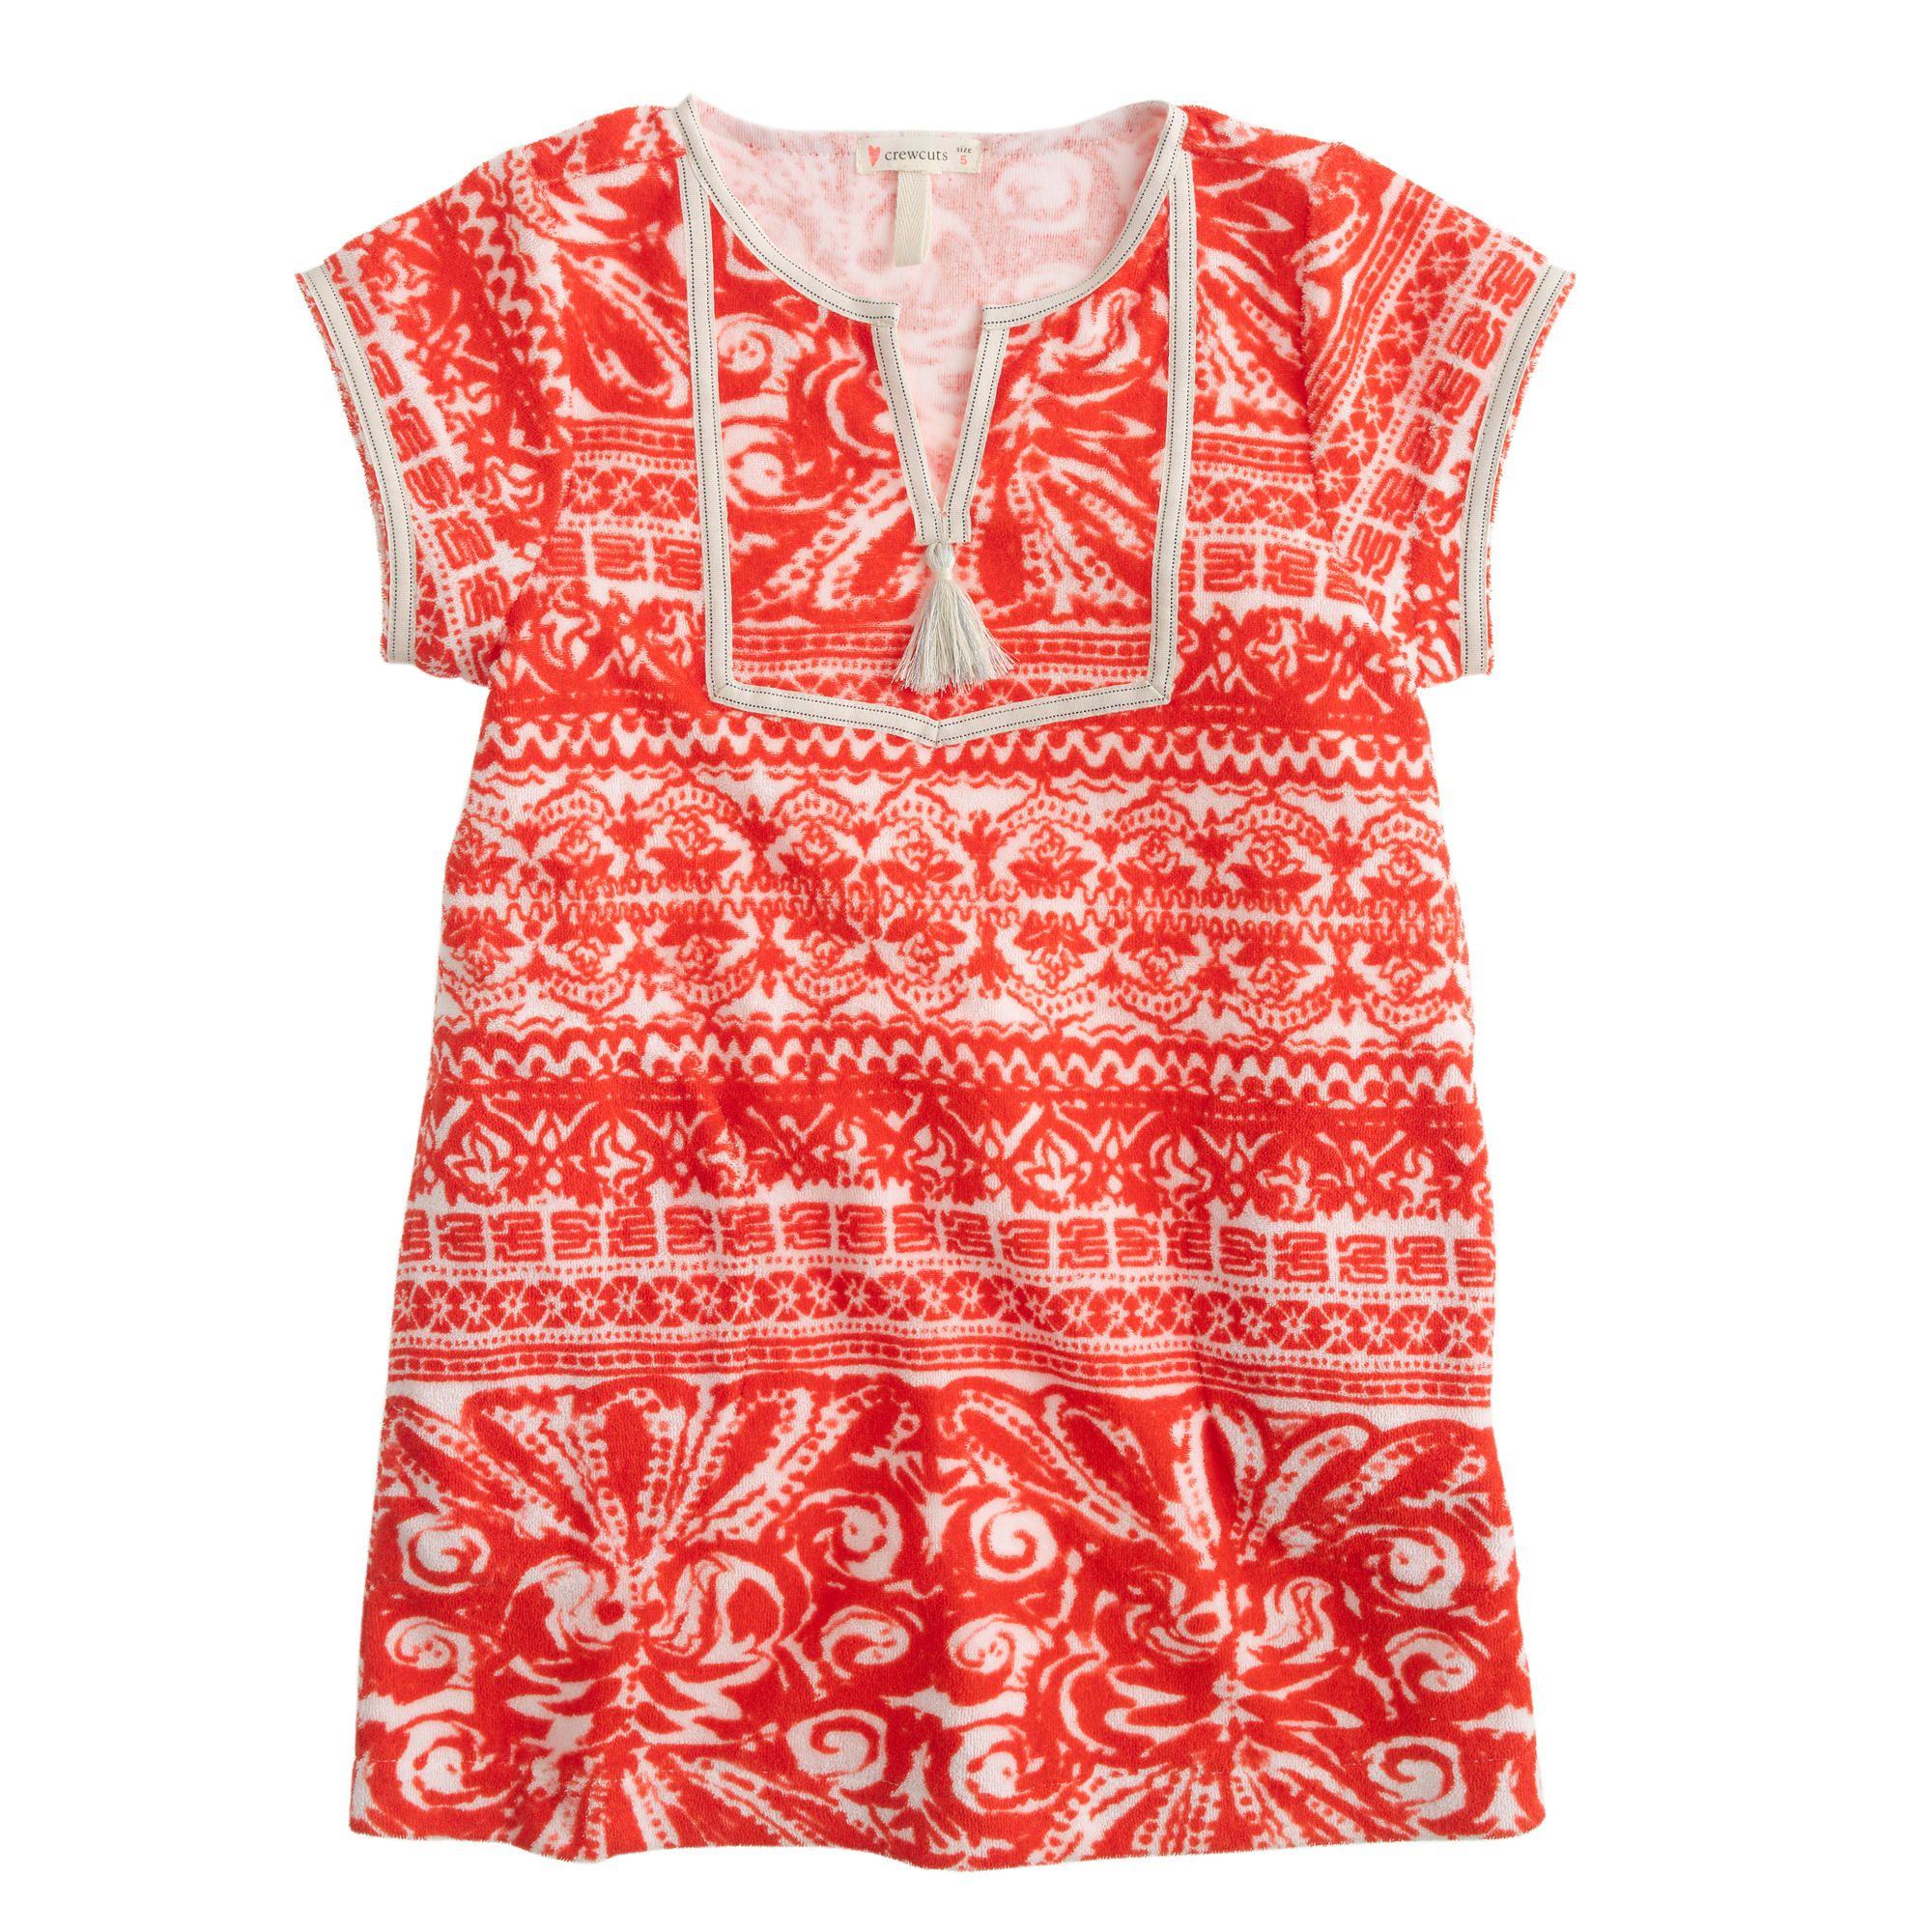 Girls' terry cloth tassel dress - beach cover-ups -Girls- J.Crew